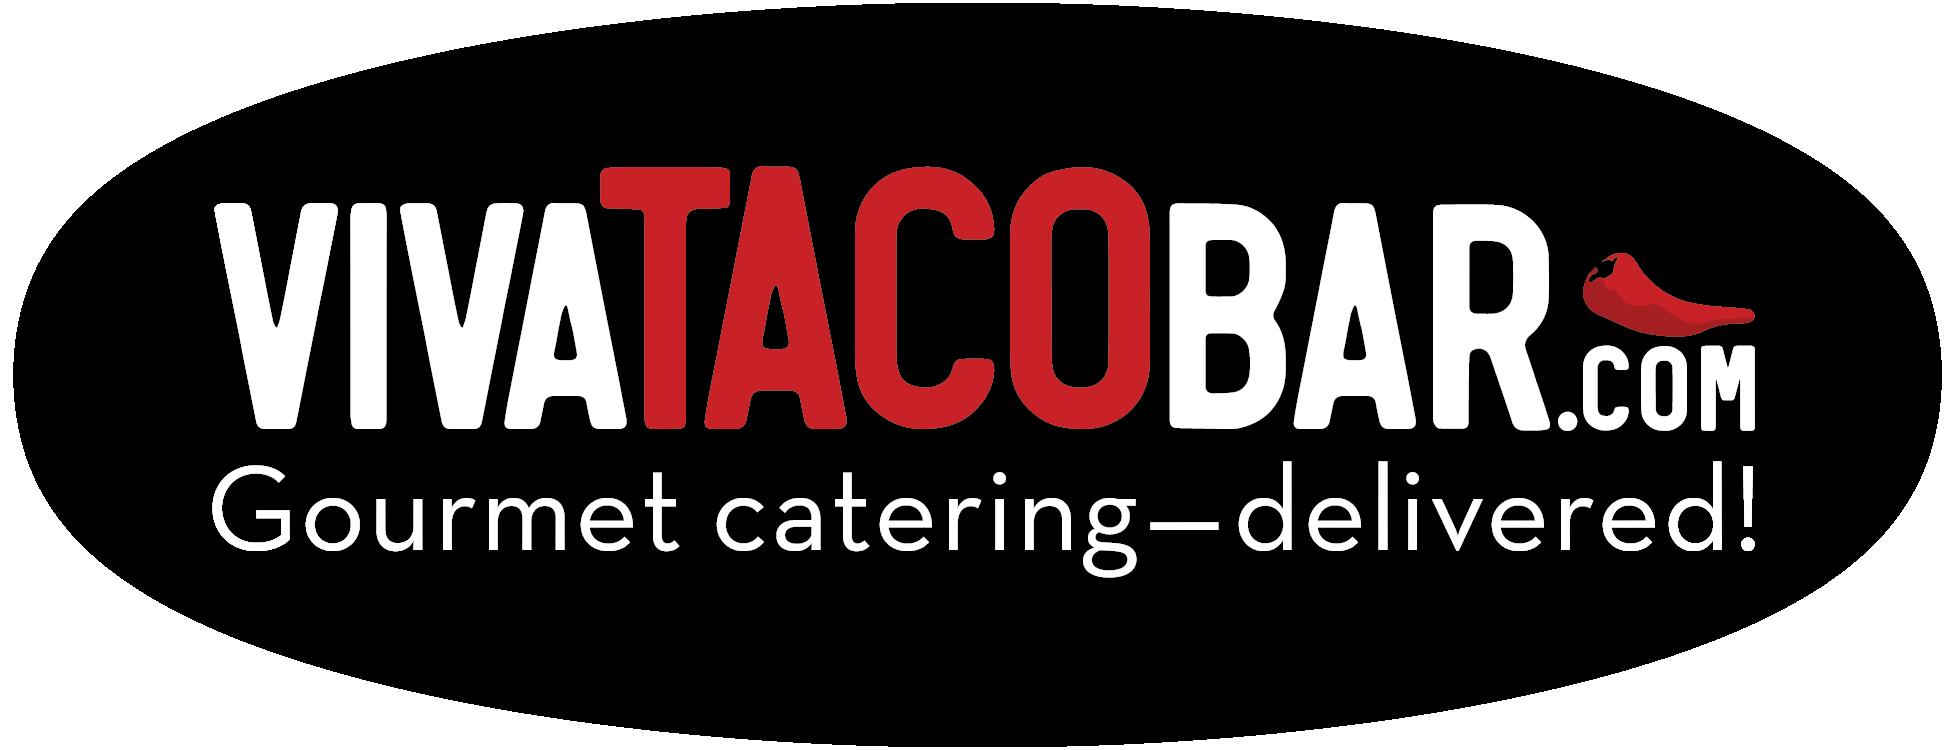 VivaTacoBar_GourmetCateringDelivered